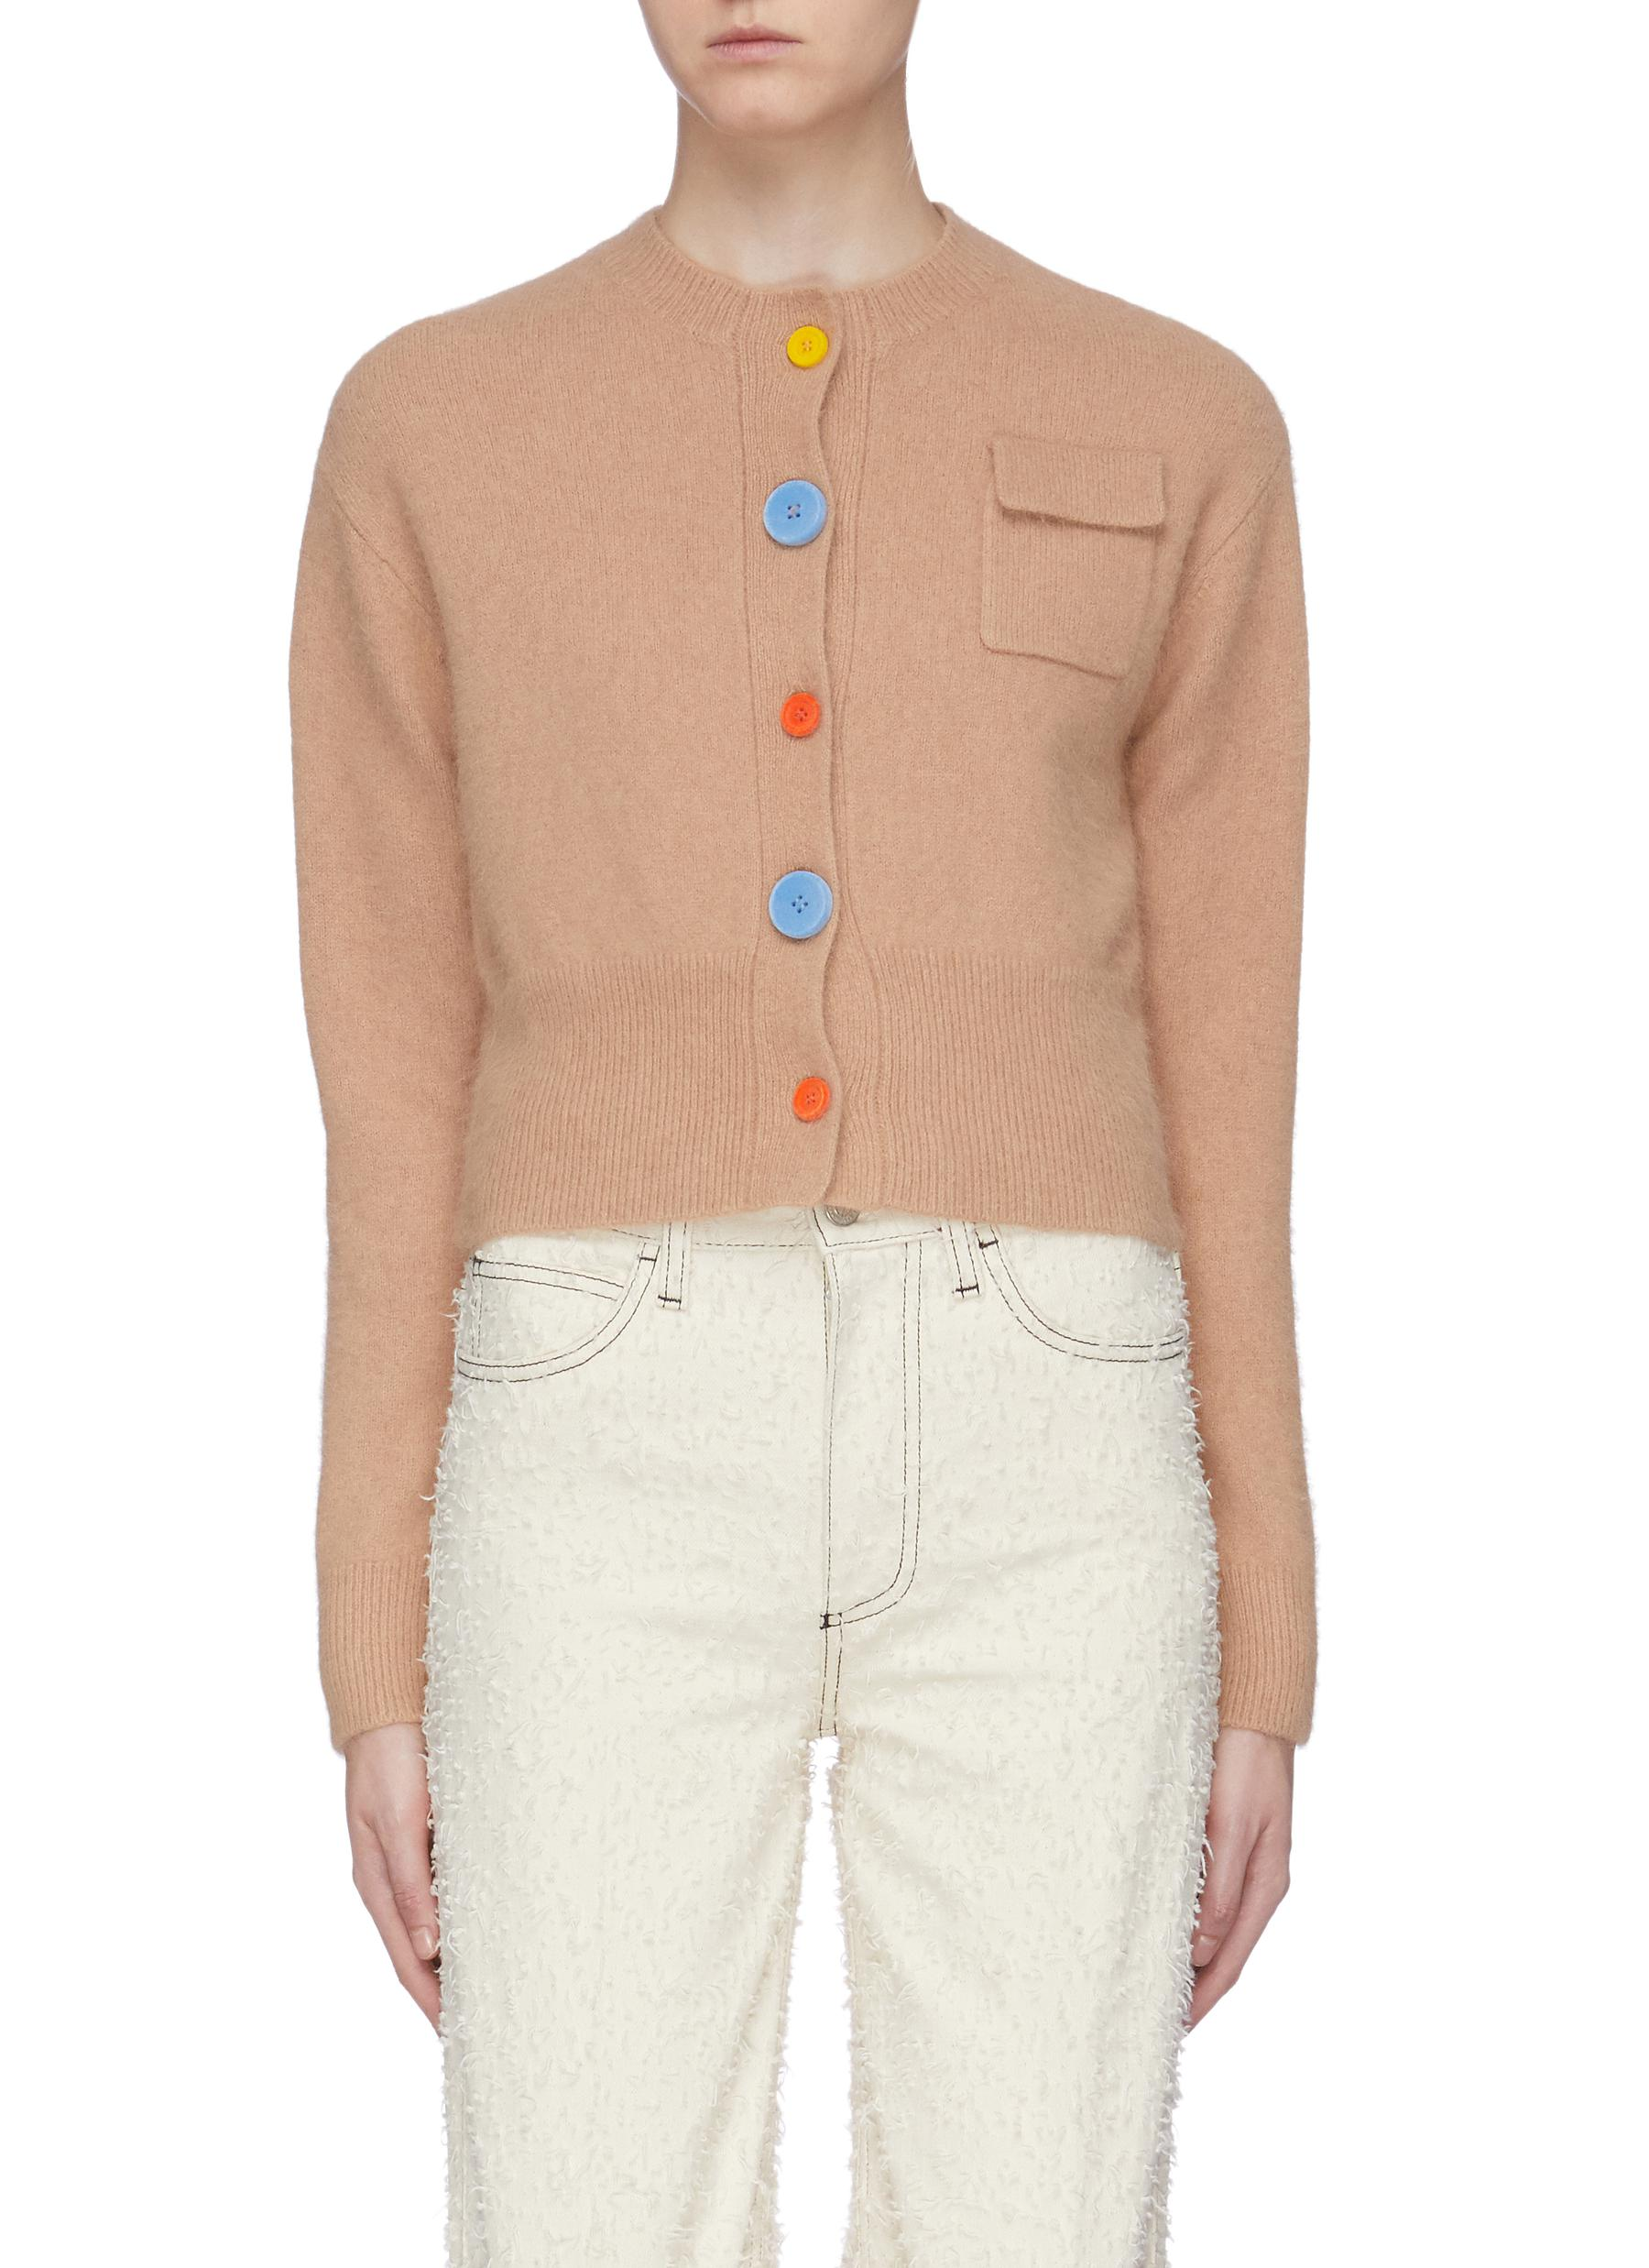 Colourblock button cardigan by Short Sentence